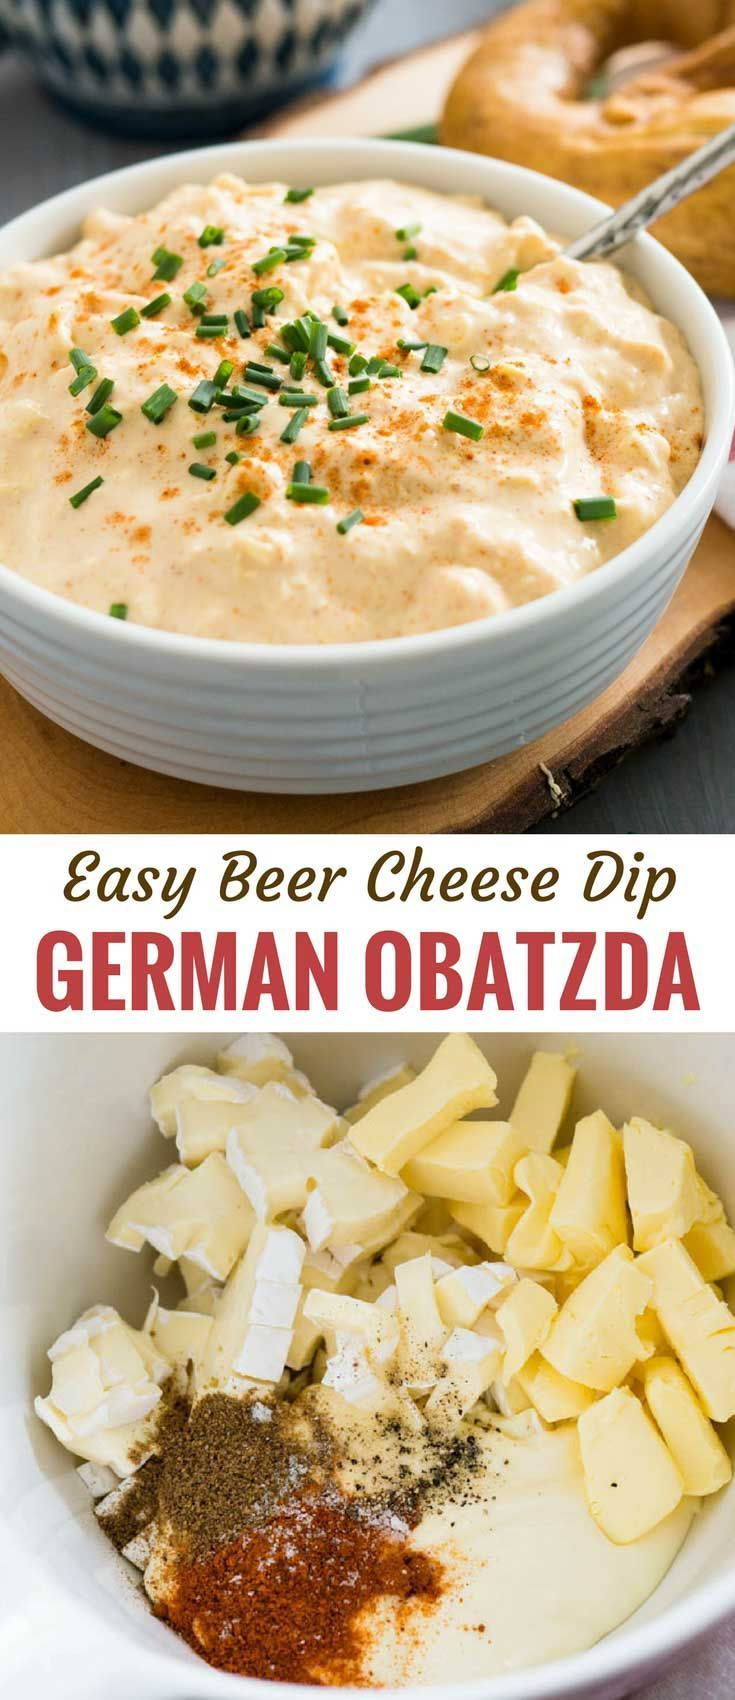 Obatzda Recipe (German Beer Cheese Dip) | Plated Cravings